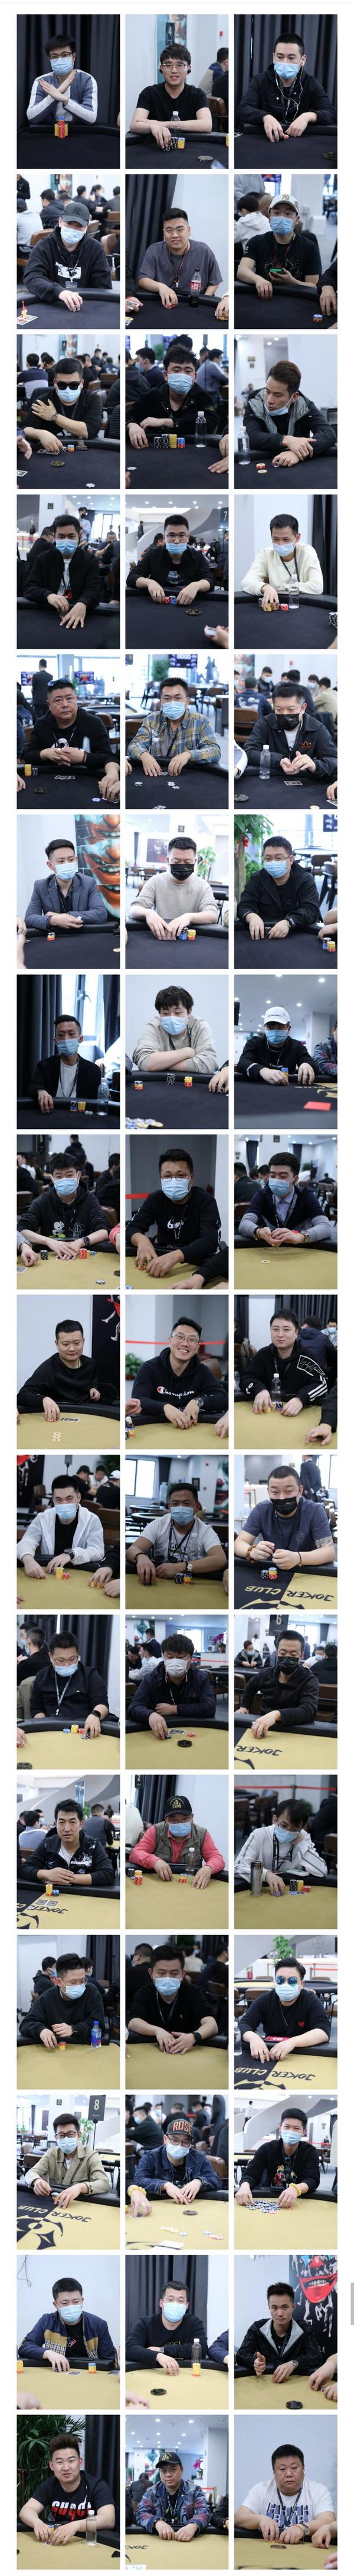 2021SCPT泉城杯 | 主赛轻松破保!共115人晋级下一轮!